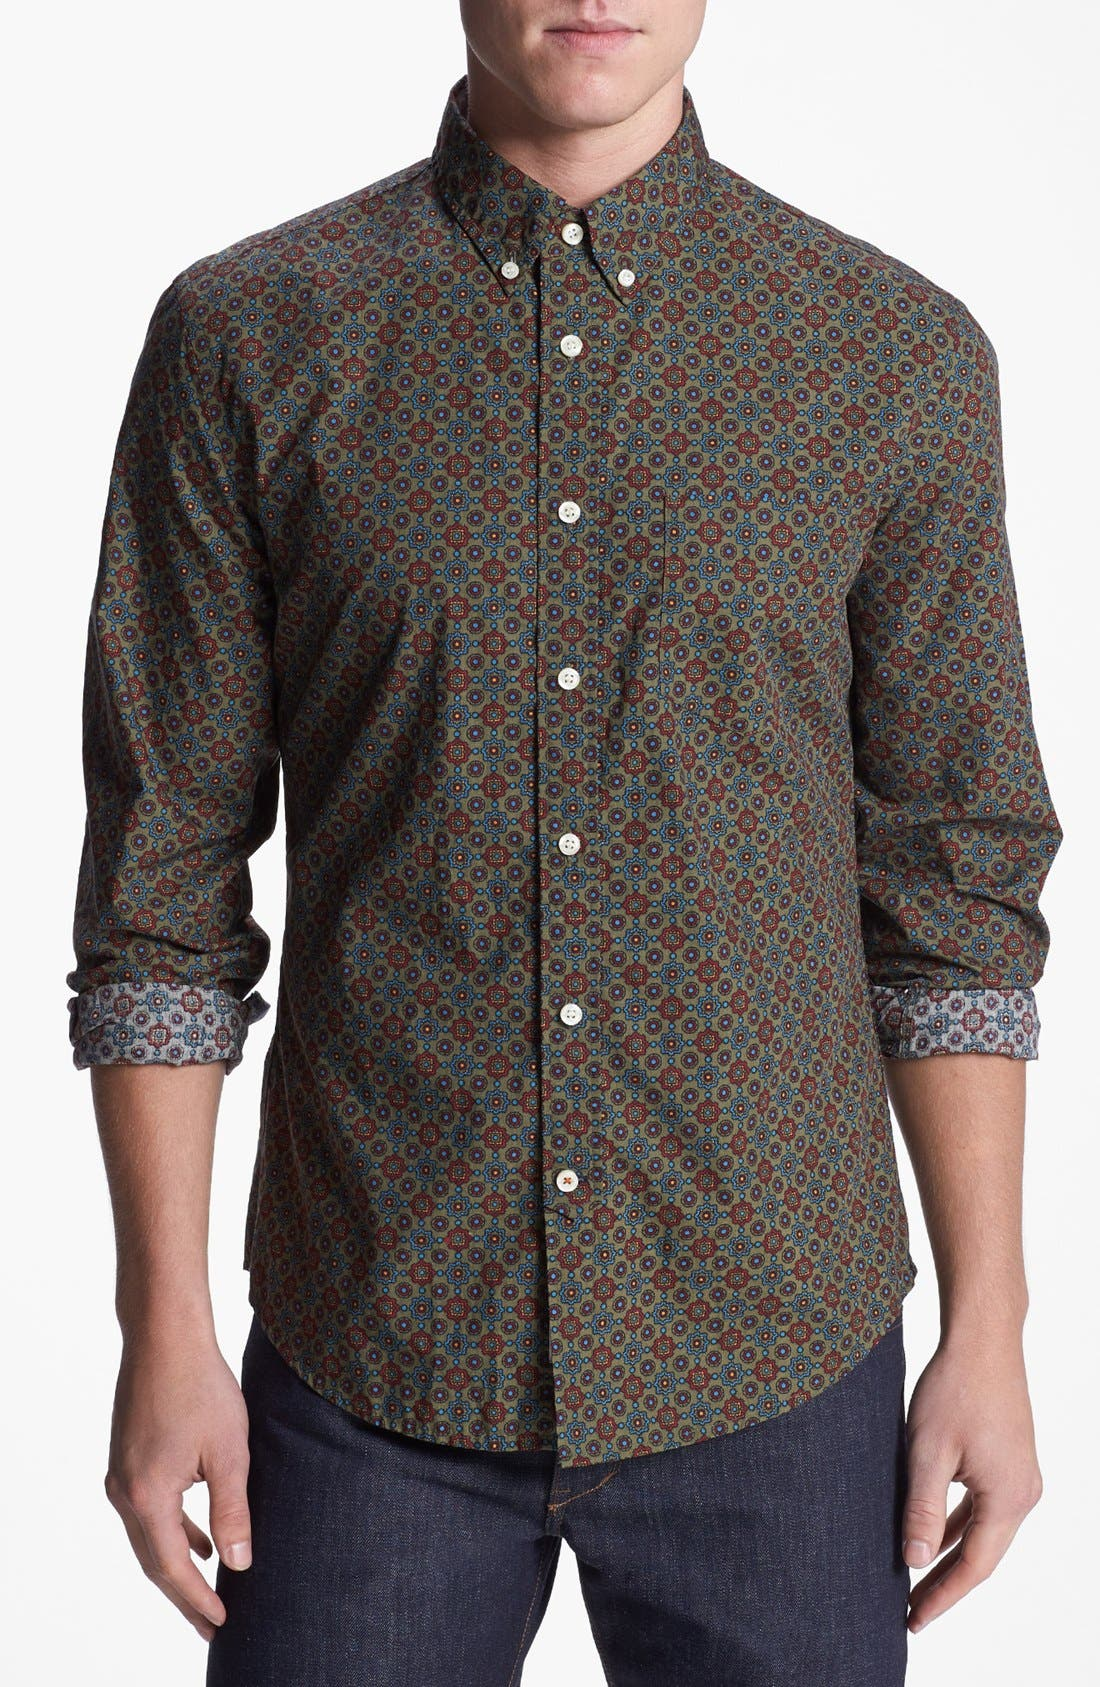 Alternate Image 1 Selected - Dockers® Print Woven Shirt